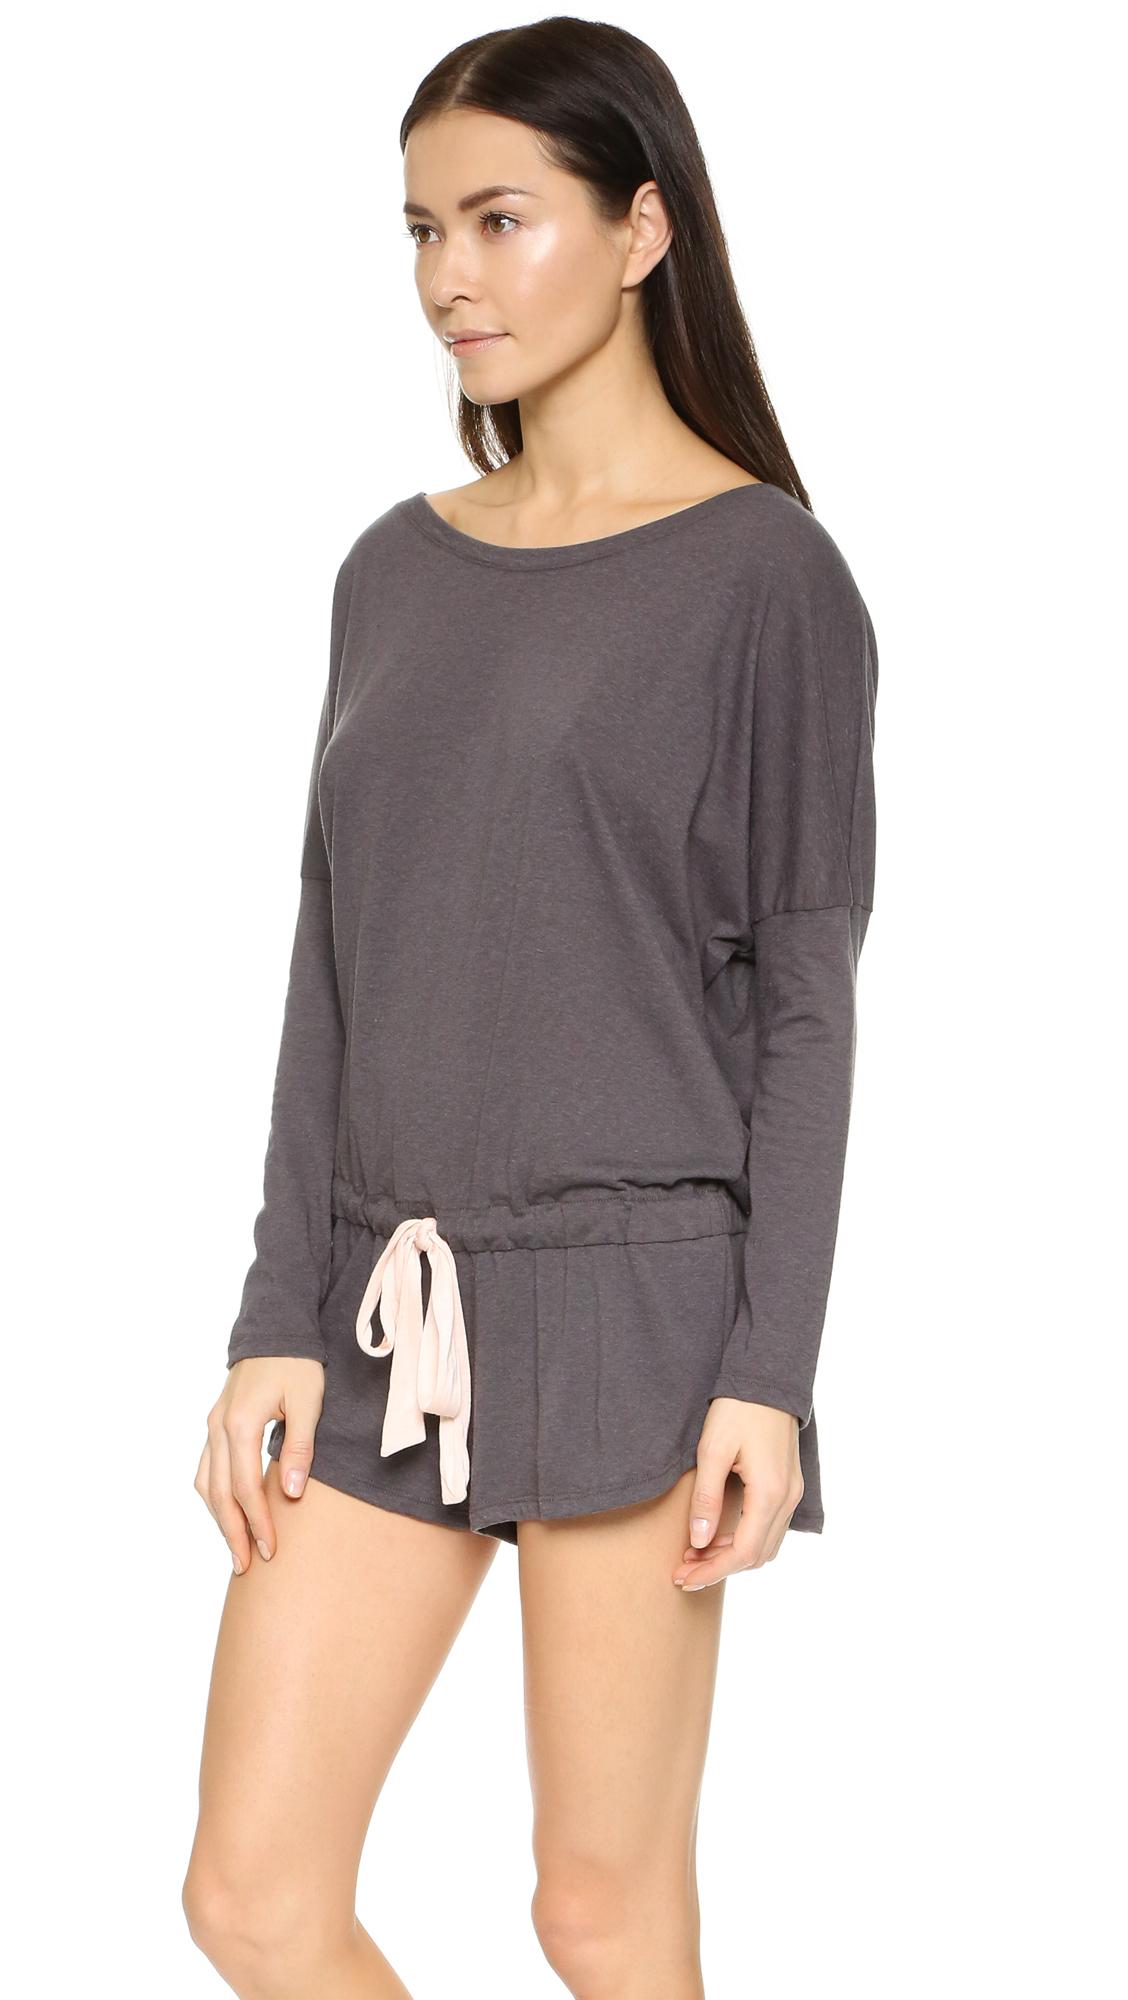 d6d89fc31bbc Lyst - Eberjey Heather Pajama Romper in Gray